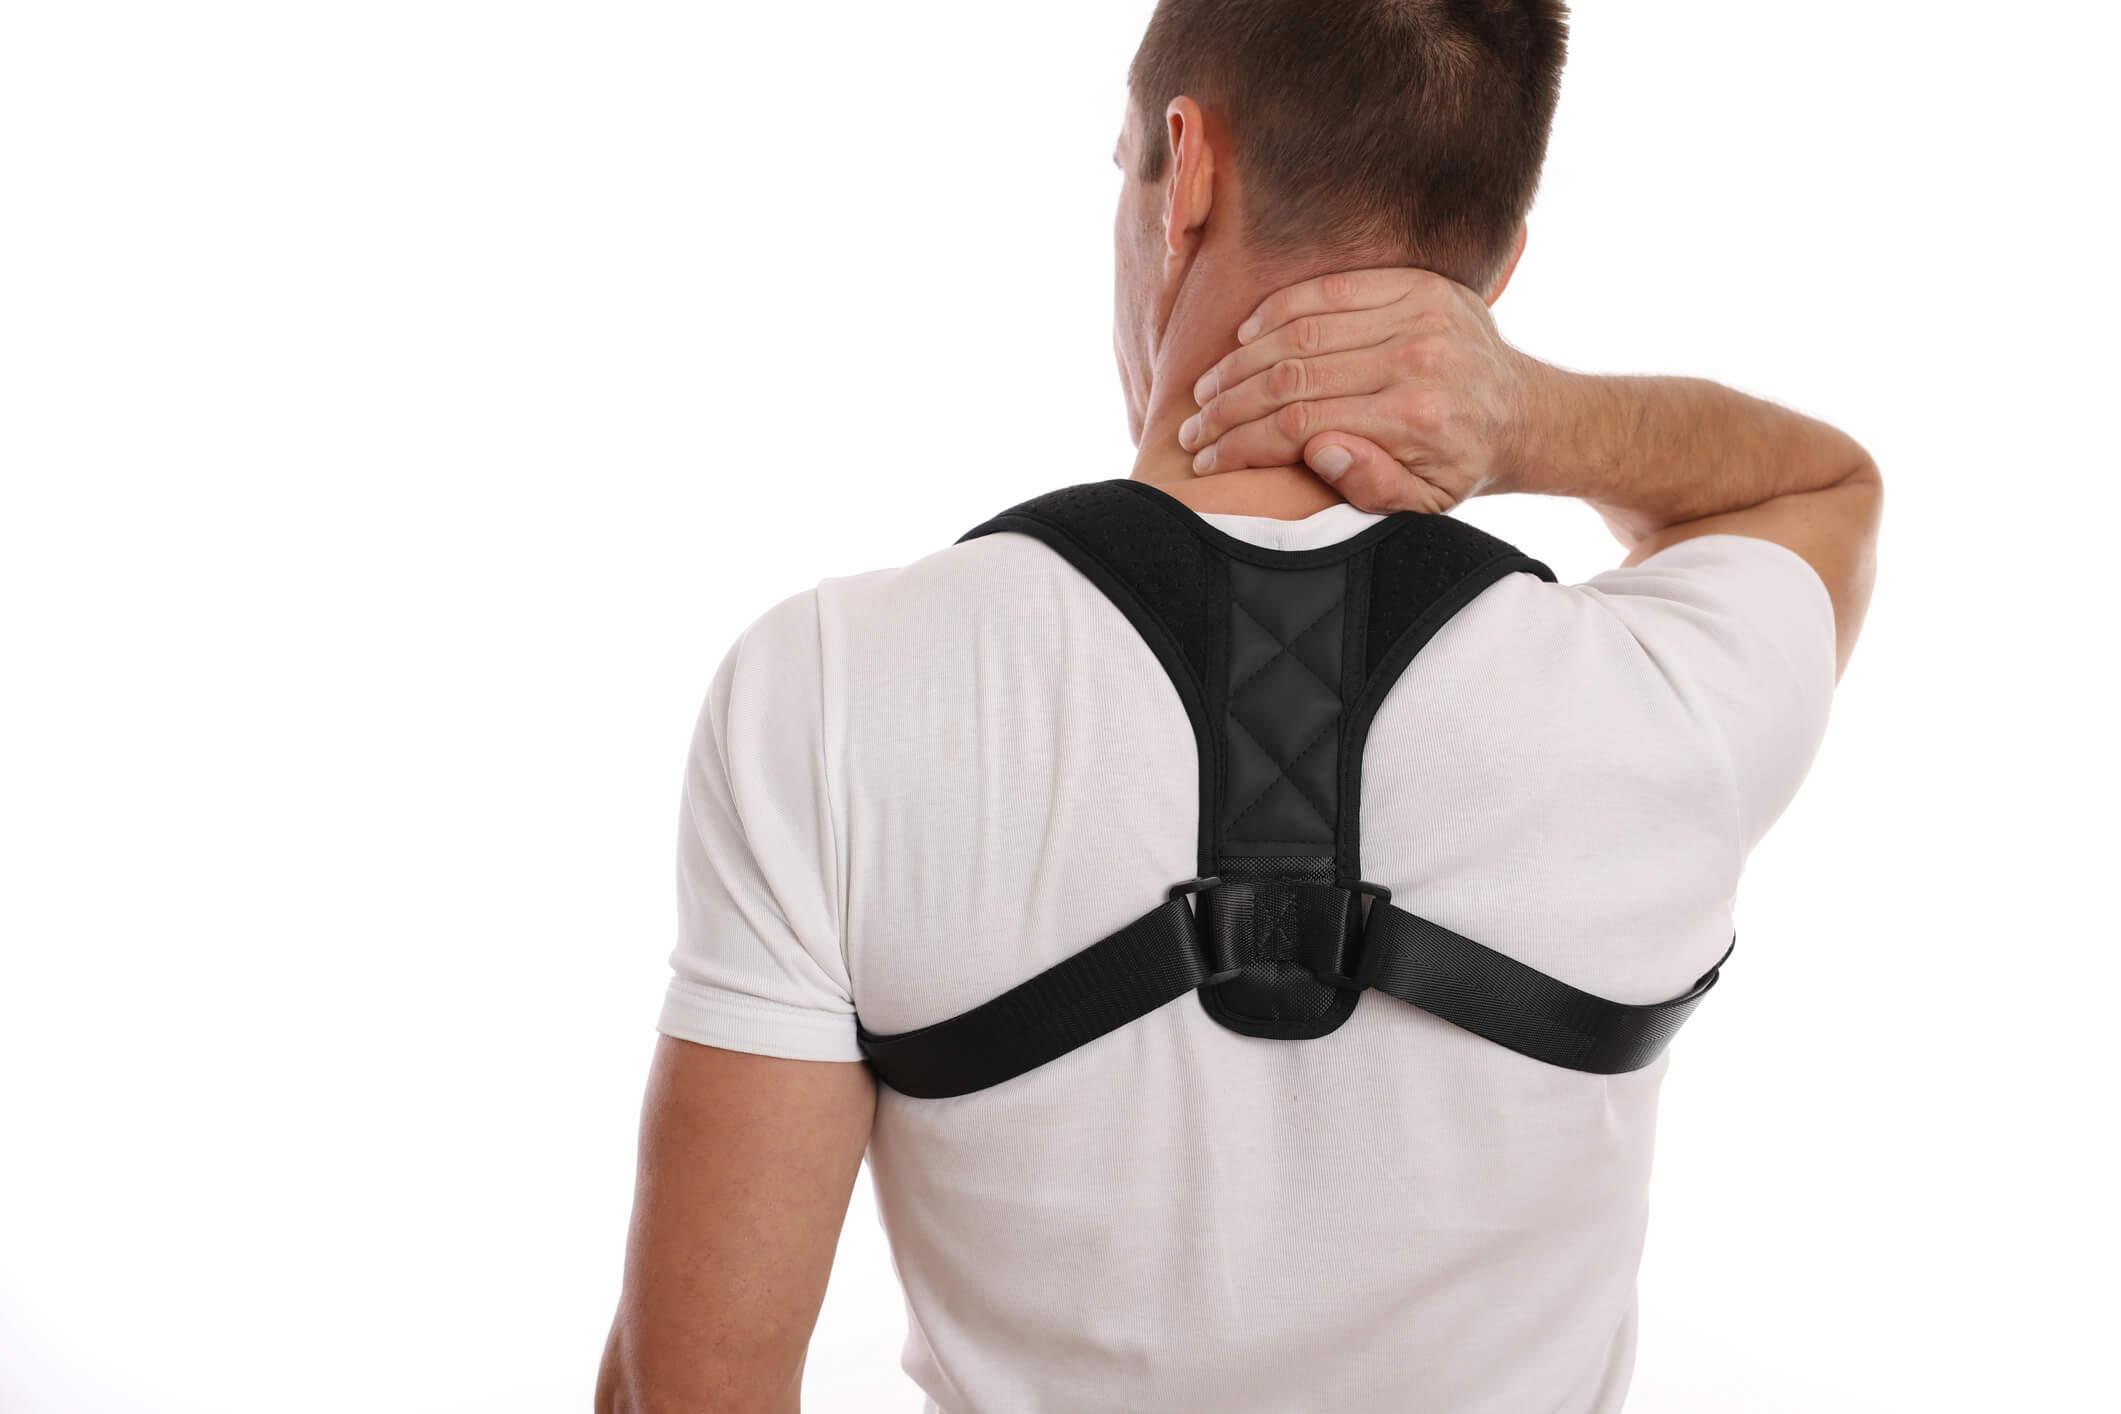 Man wearing posture brace